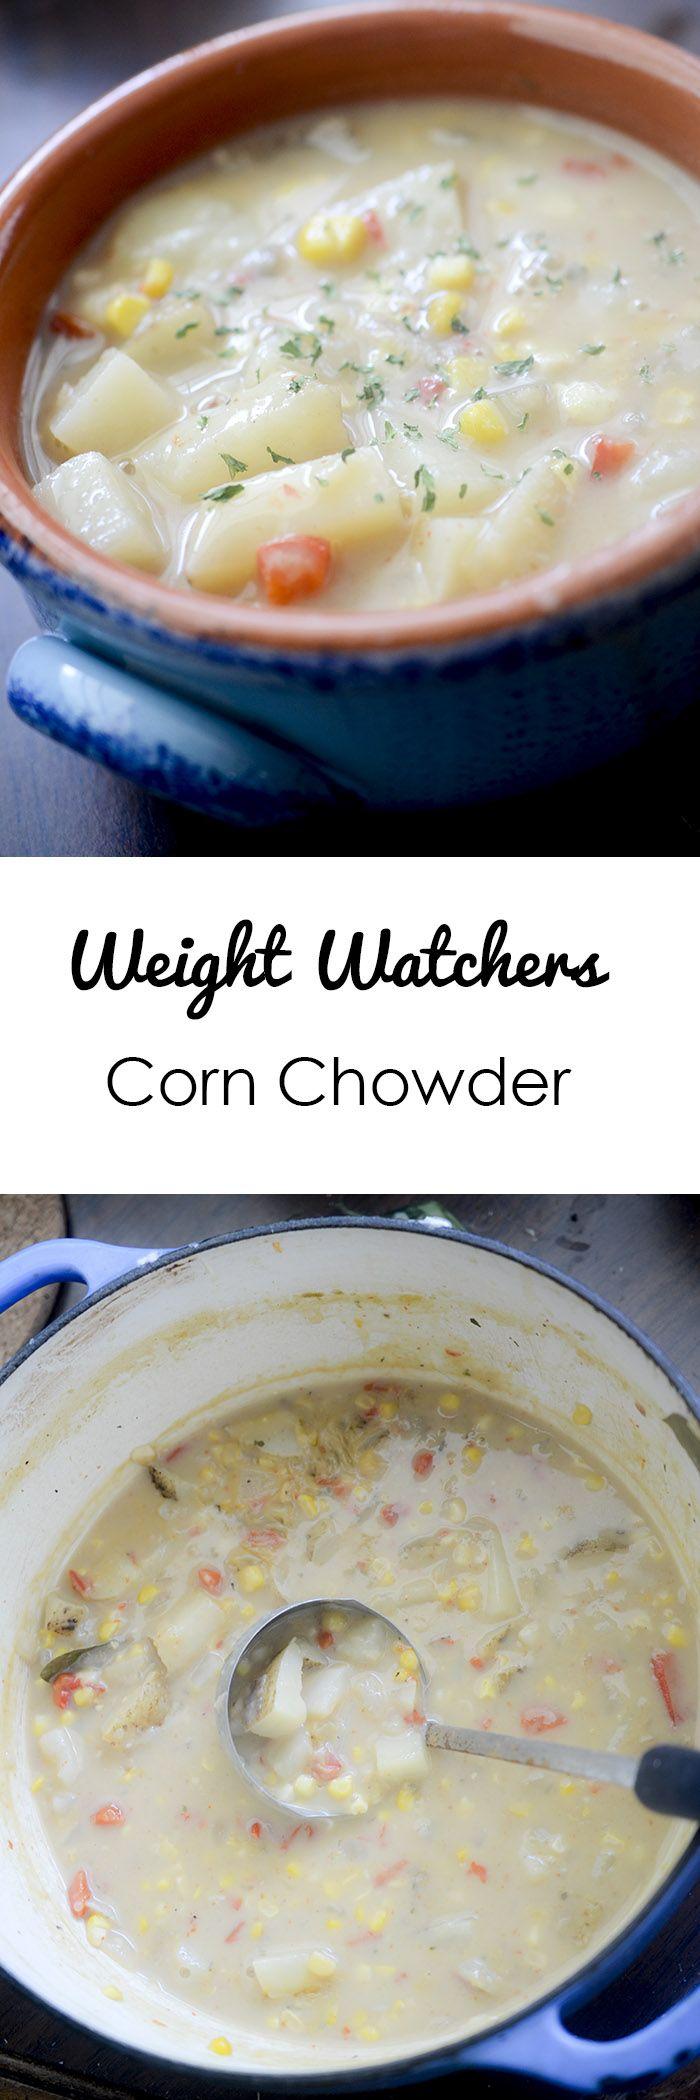 Weight Watchers Corn Chowder